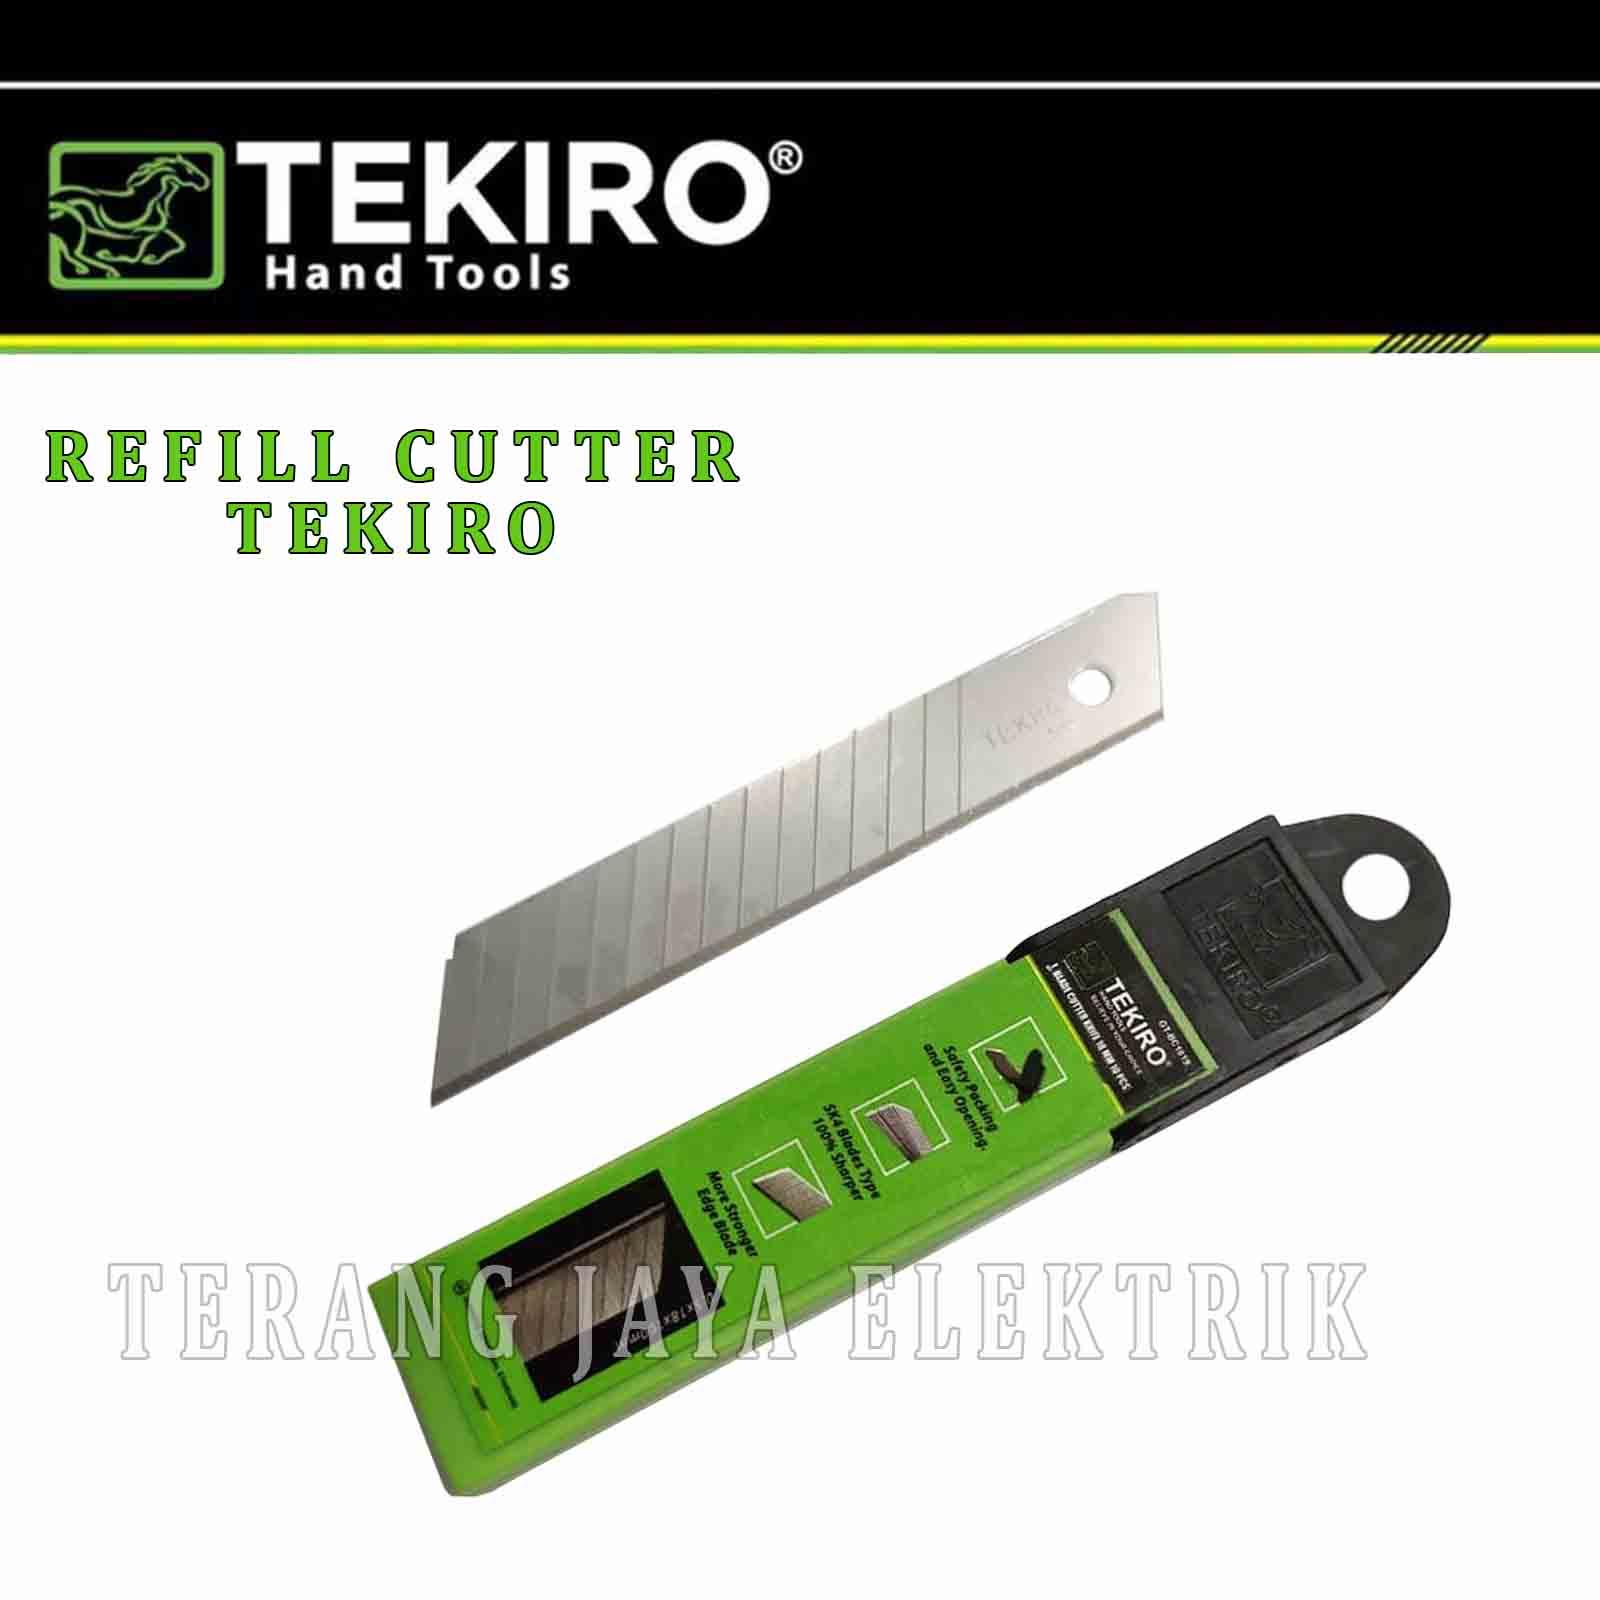 isi ulang pisau cutter/refill cutter besar 18mm tekiro isi 10 pcs